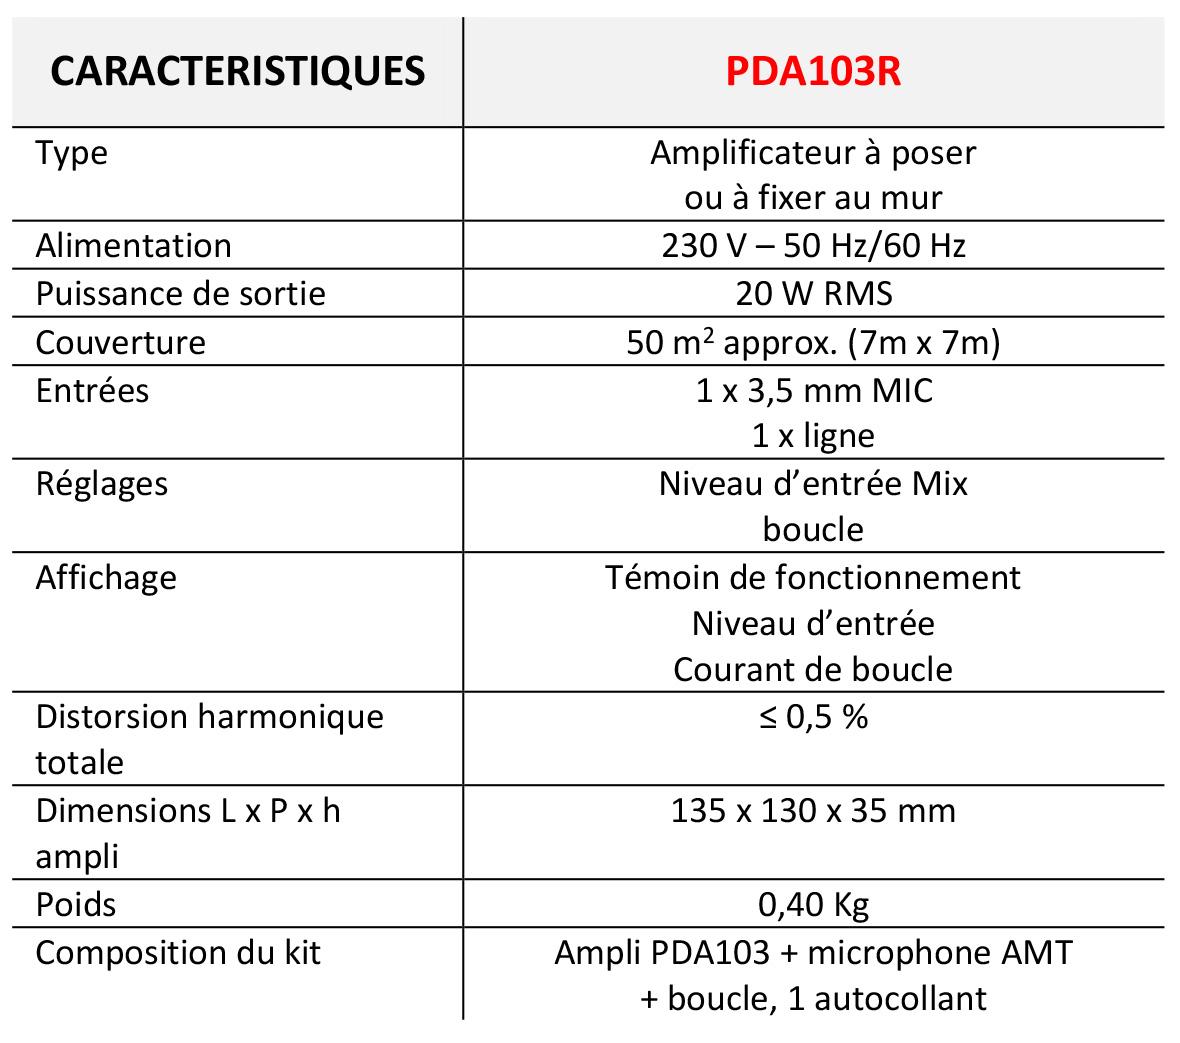 Caratéristiques PDA103R